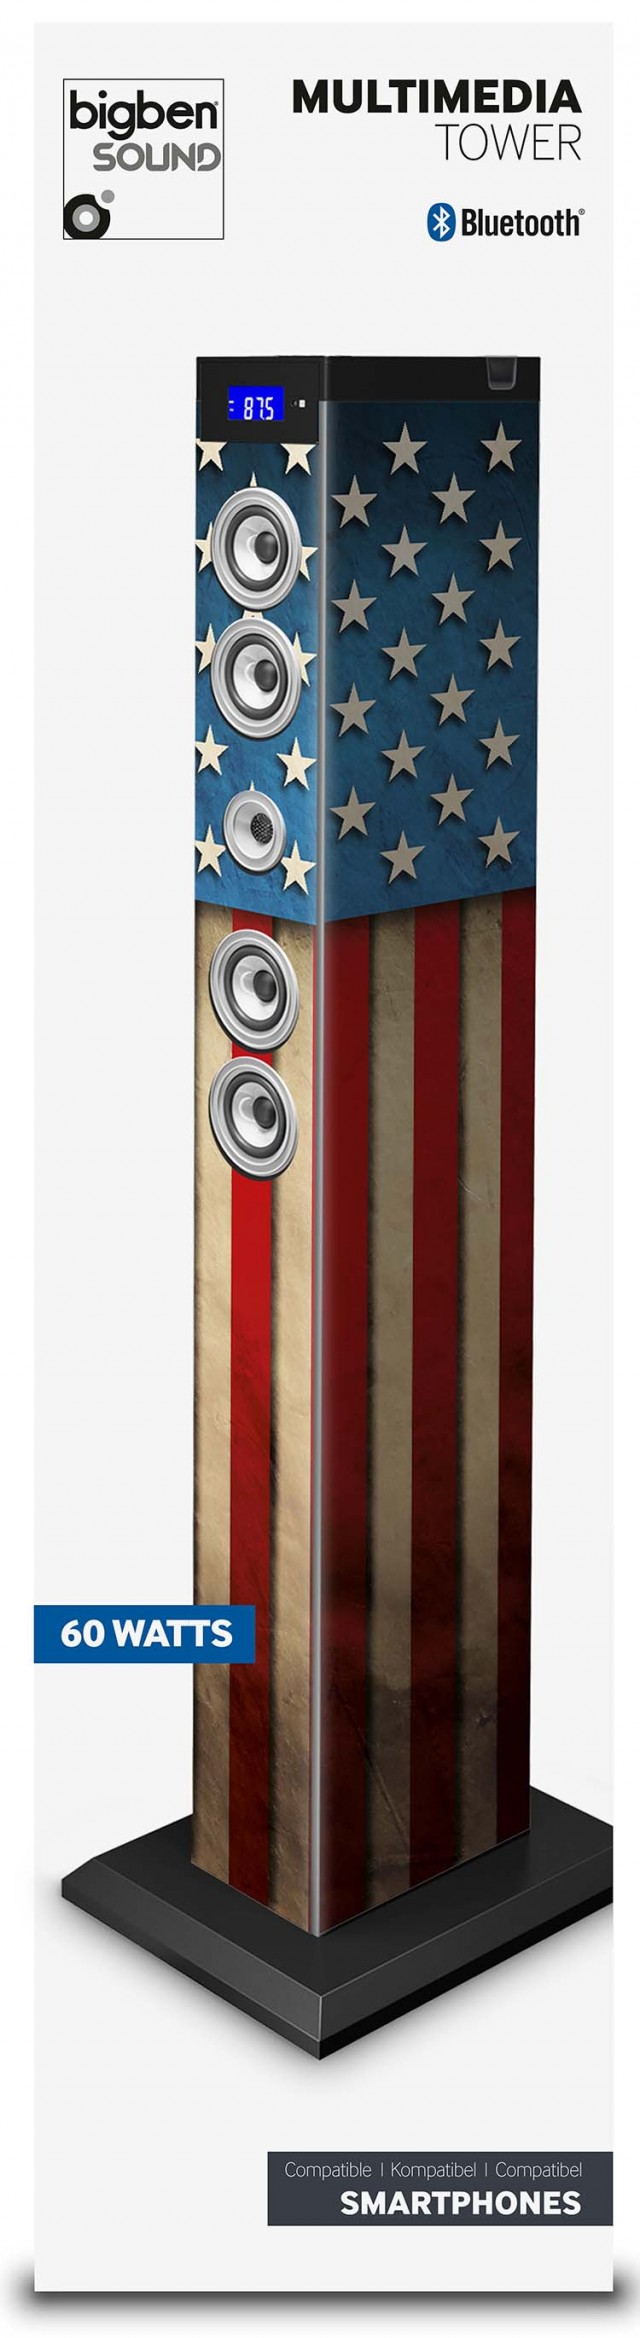 Sound Tower TW9 – USA - Packshot